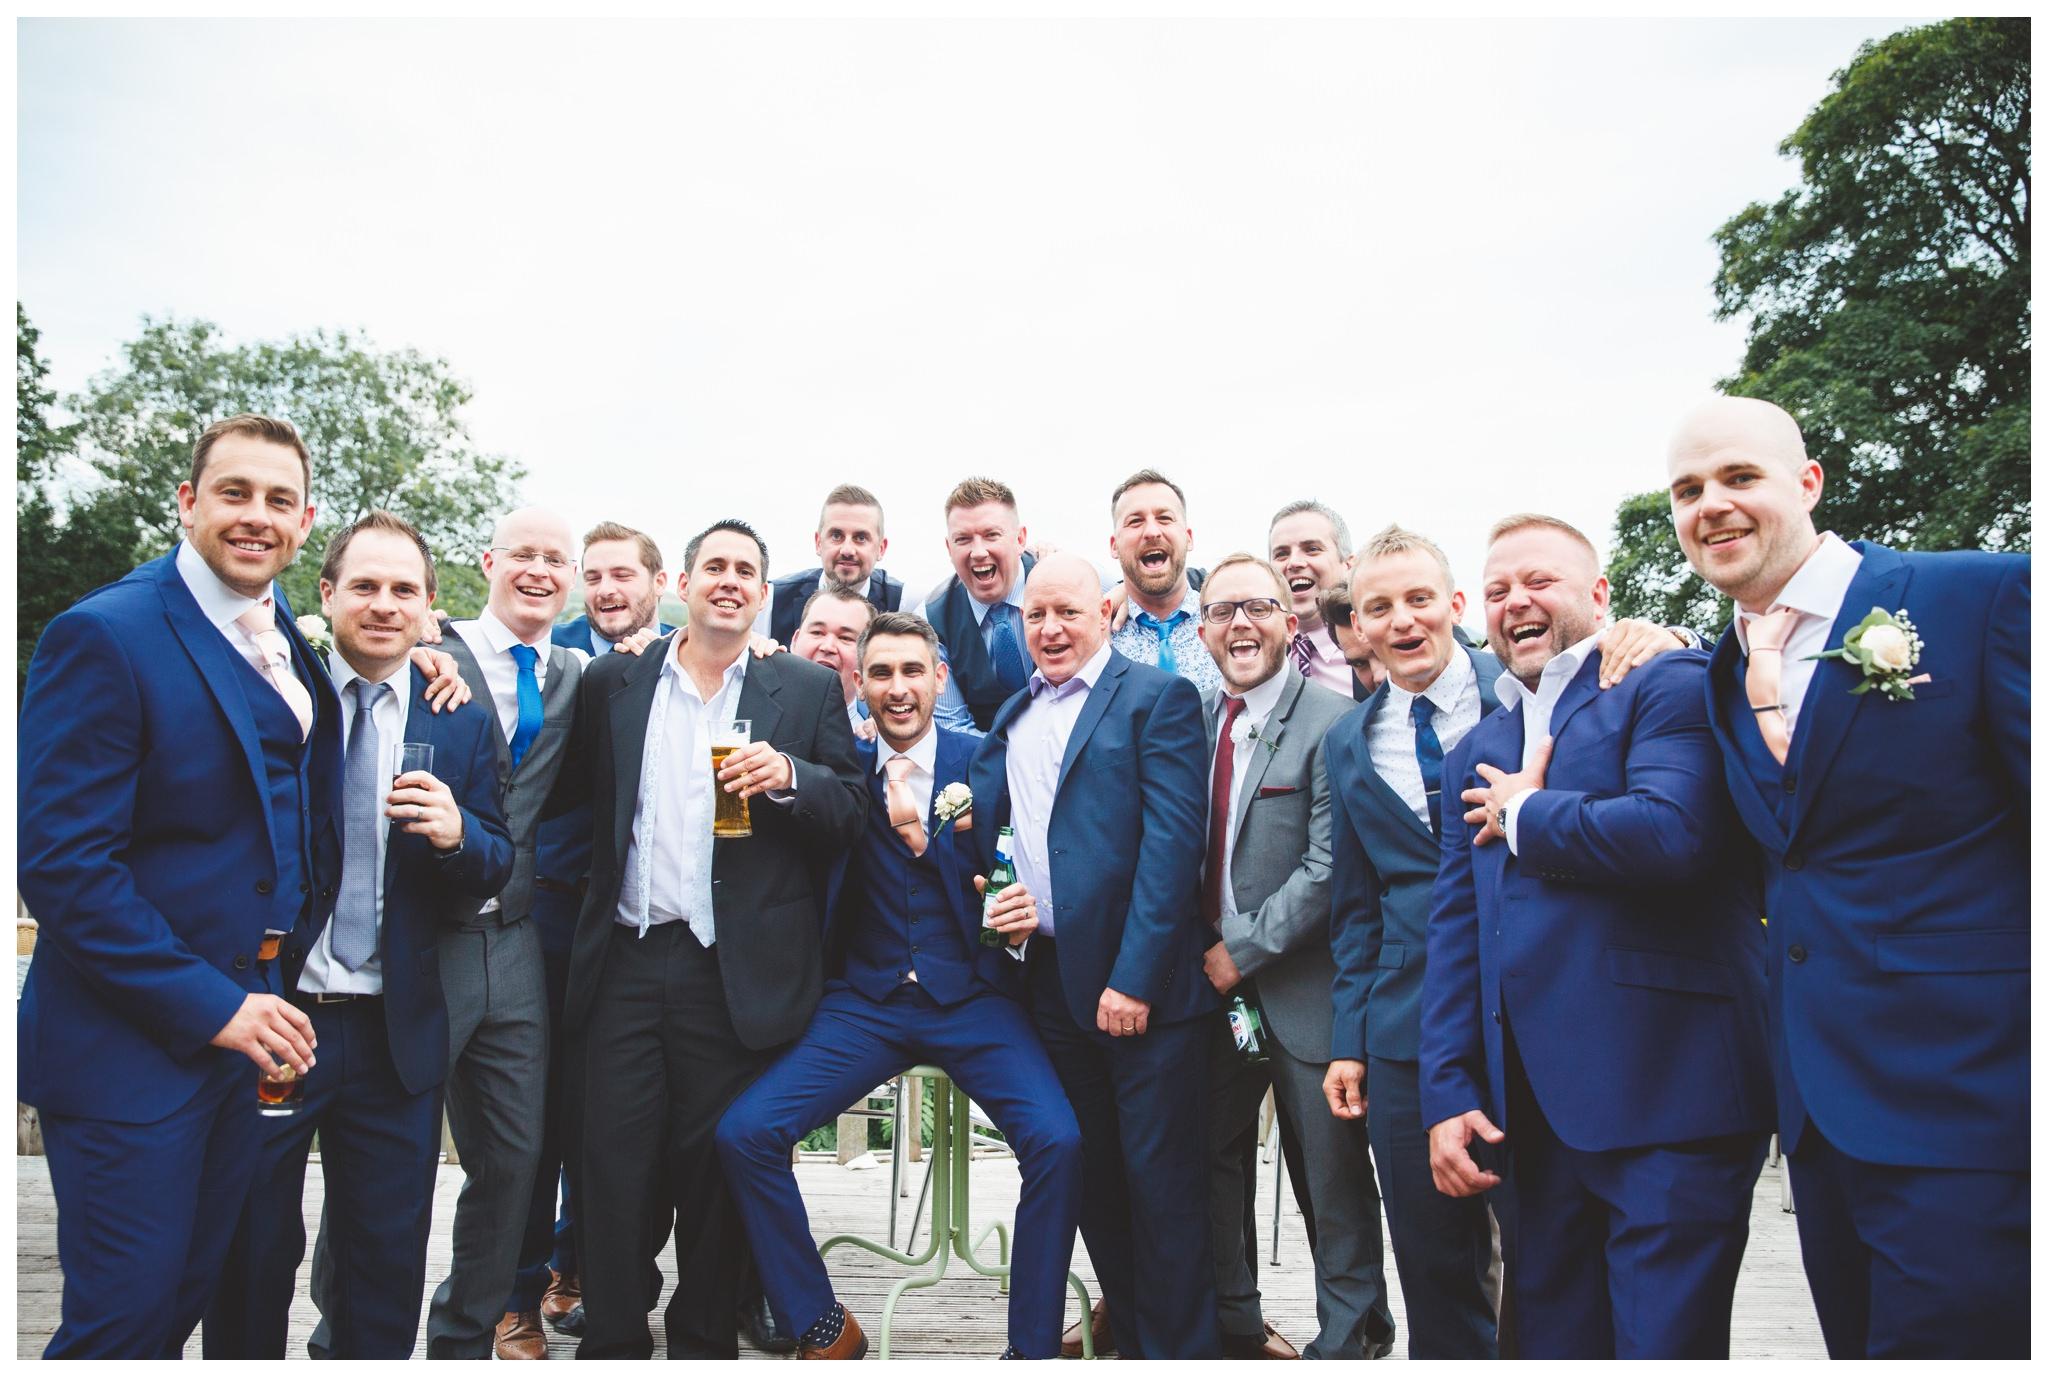 Richard Savage Photography - Wedding - Peterstone Court Brecon - 2016-05-11_0058